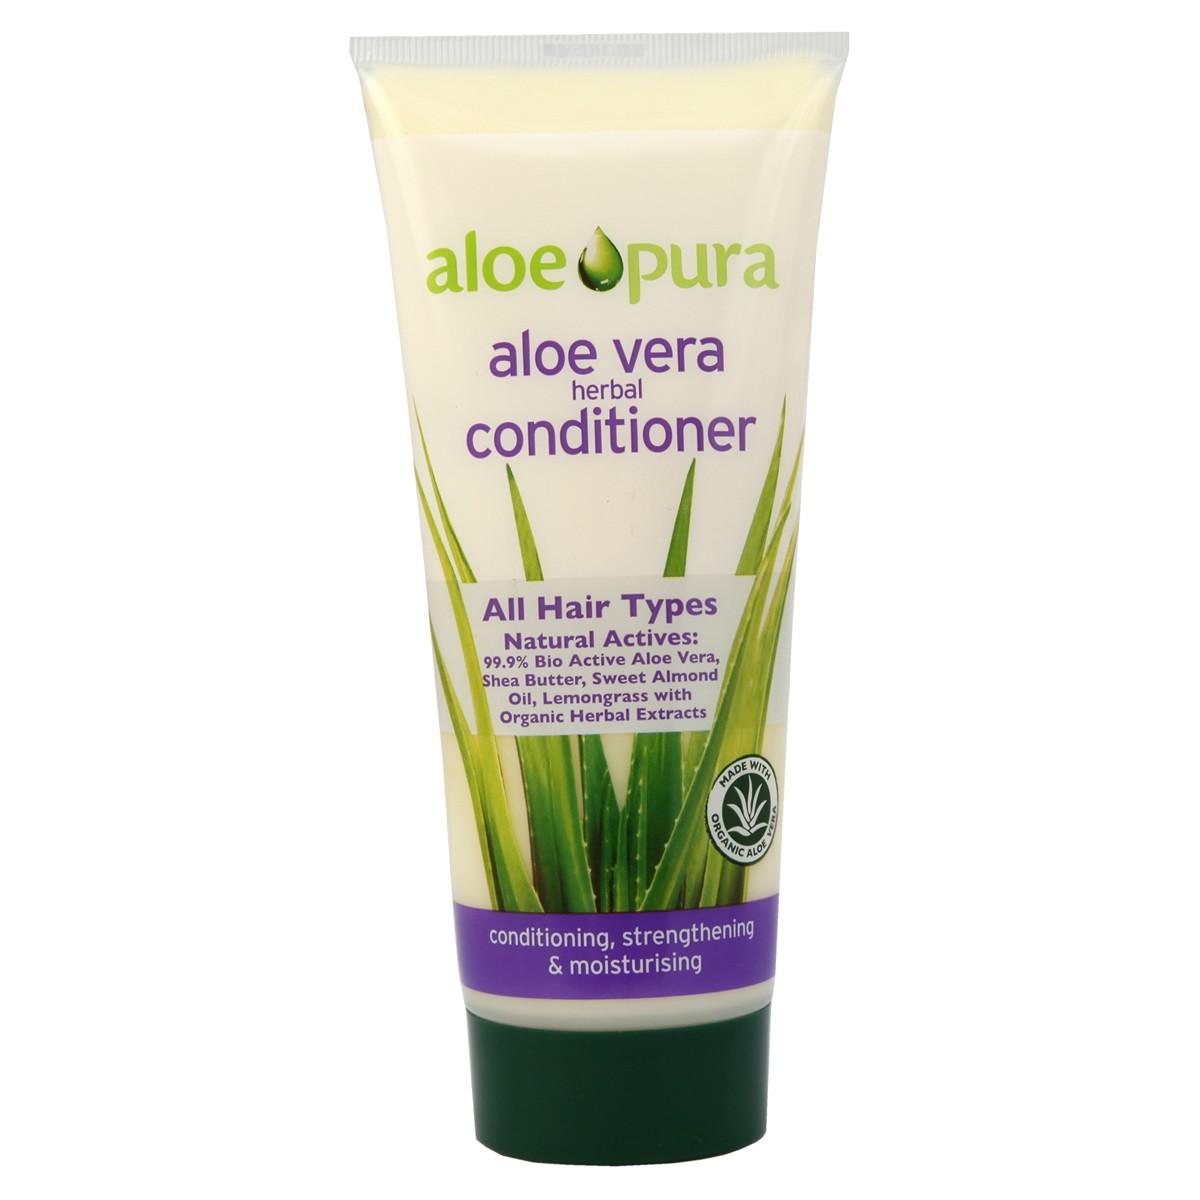 Aloe Pura Aloe Vera Herbal Conditioner for All Hair Types